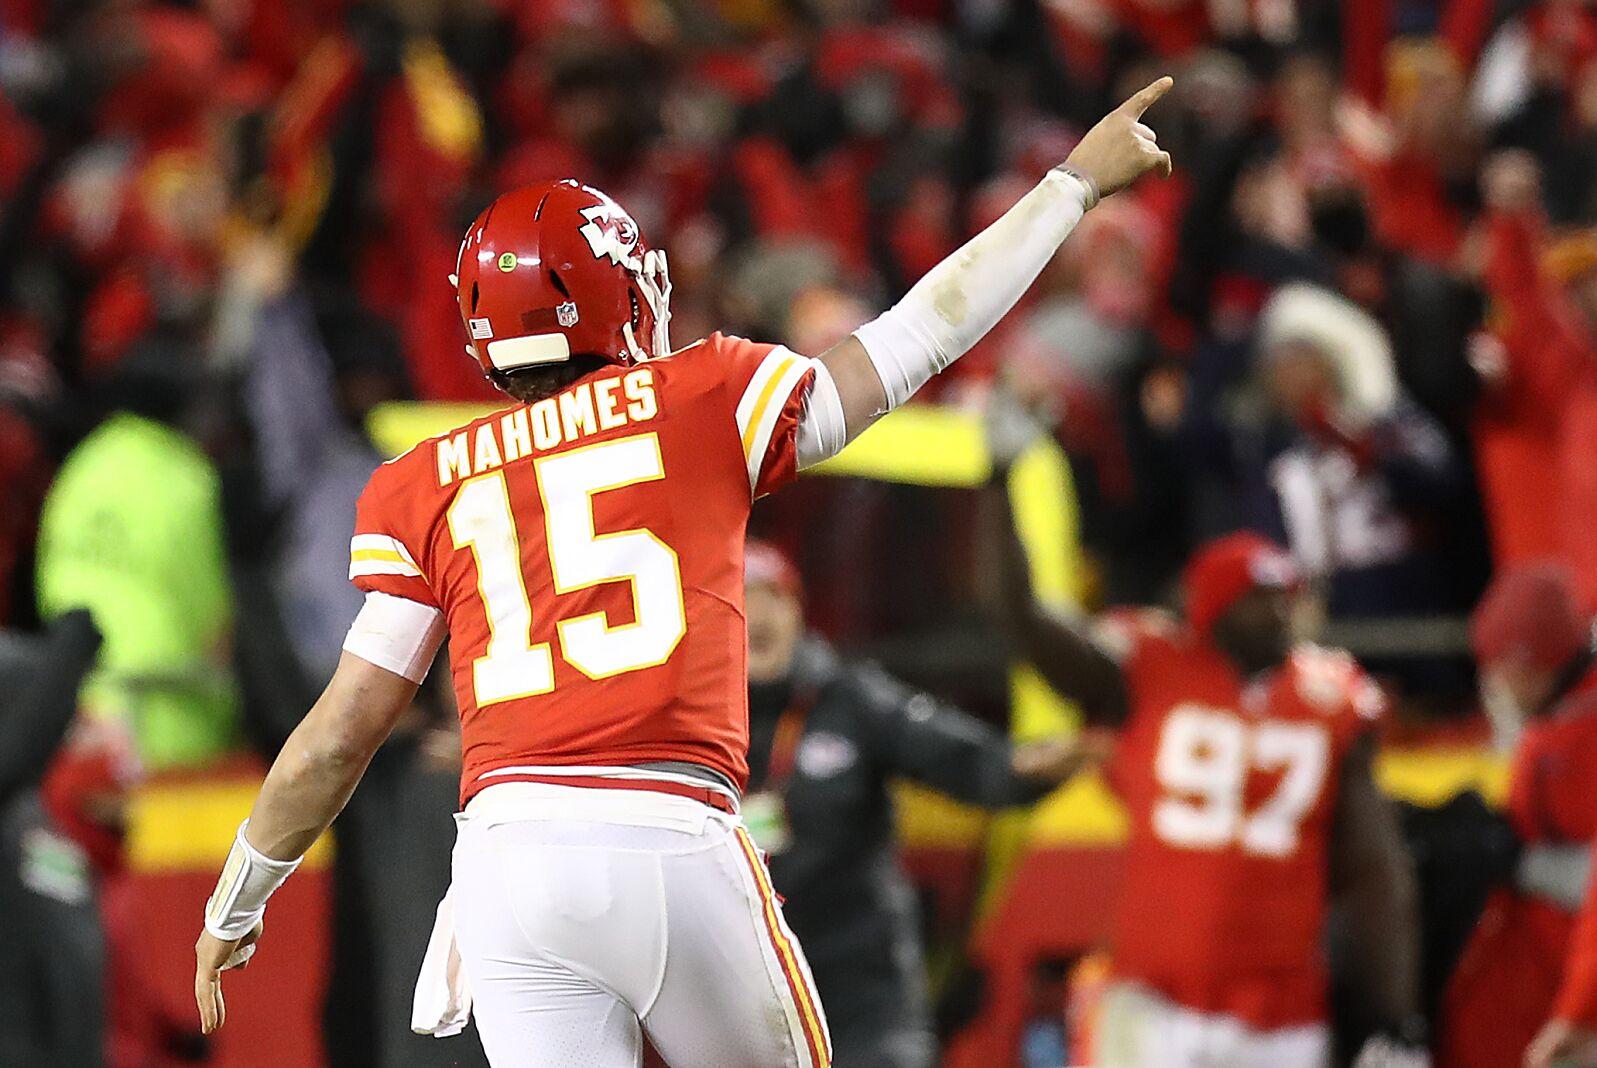 Best Fantasy Football Rankings 2020 Fantasy Football Rankings: Top Five NFL DFS QB's